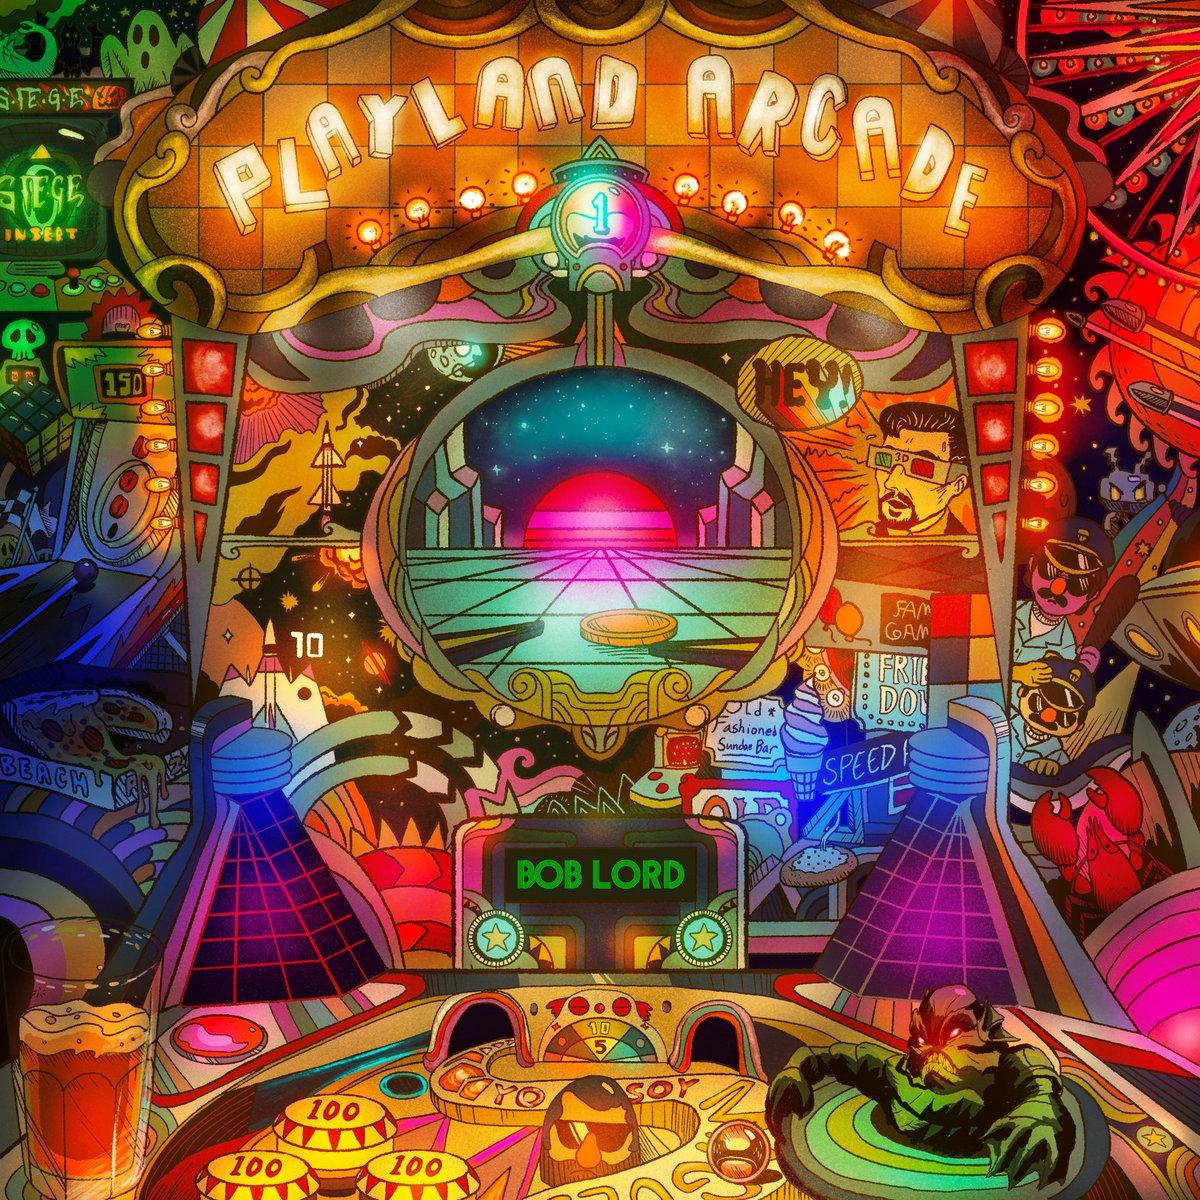 Bob Lord — Playland Arcade